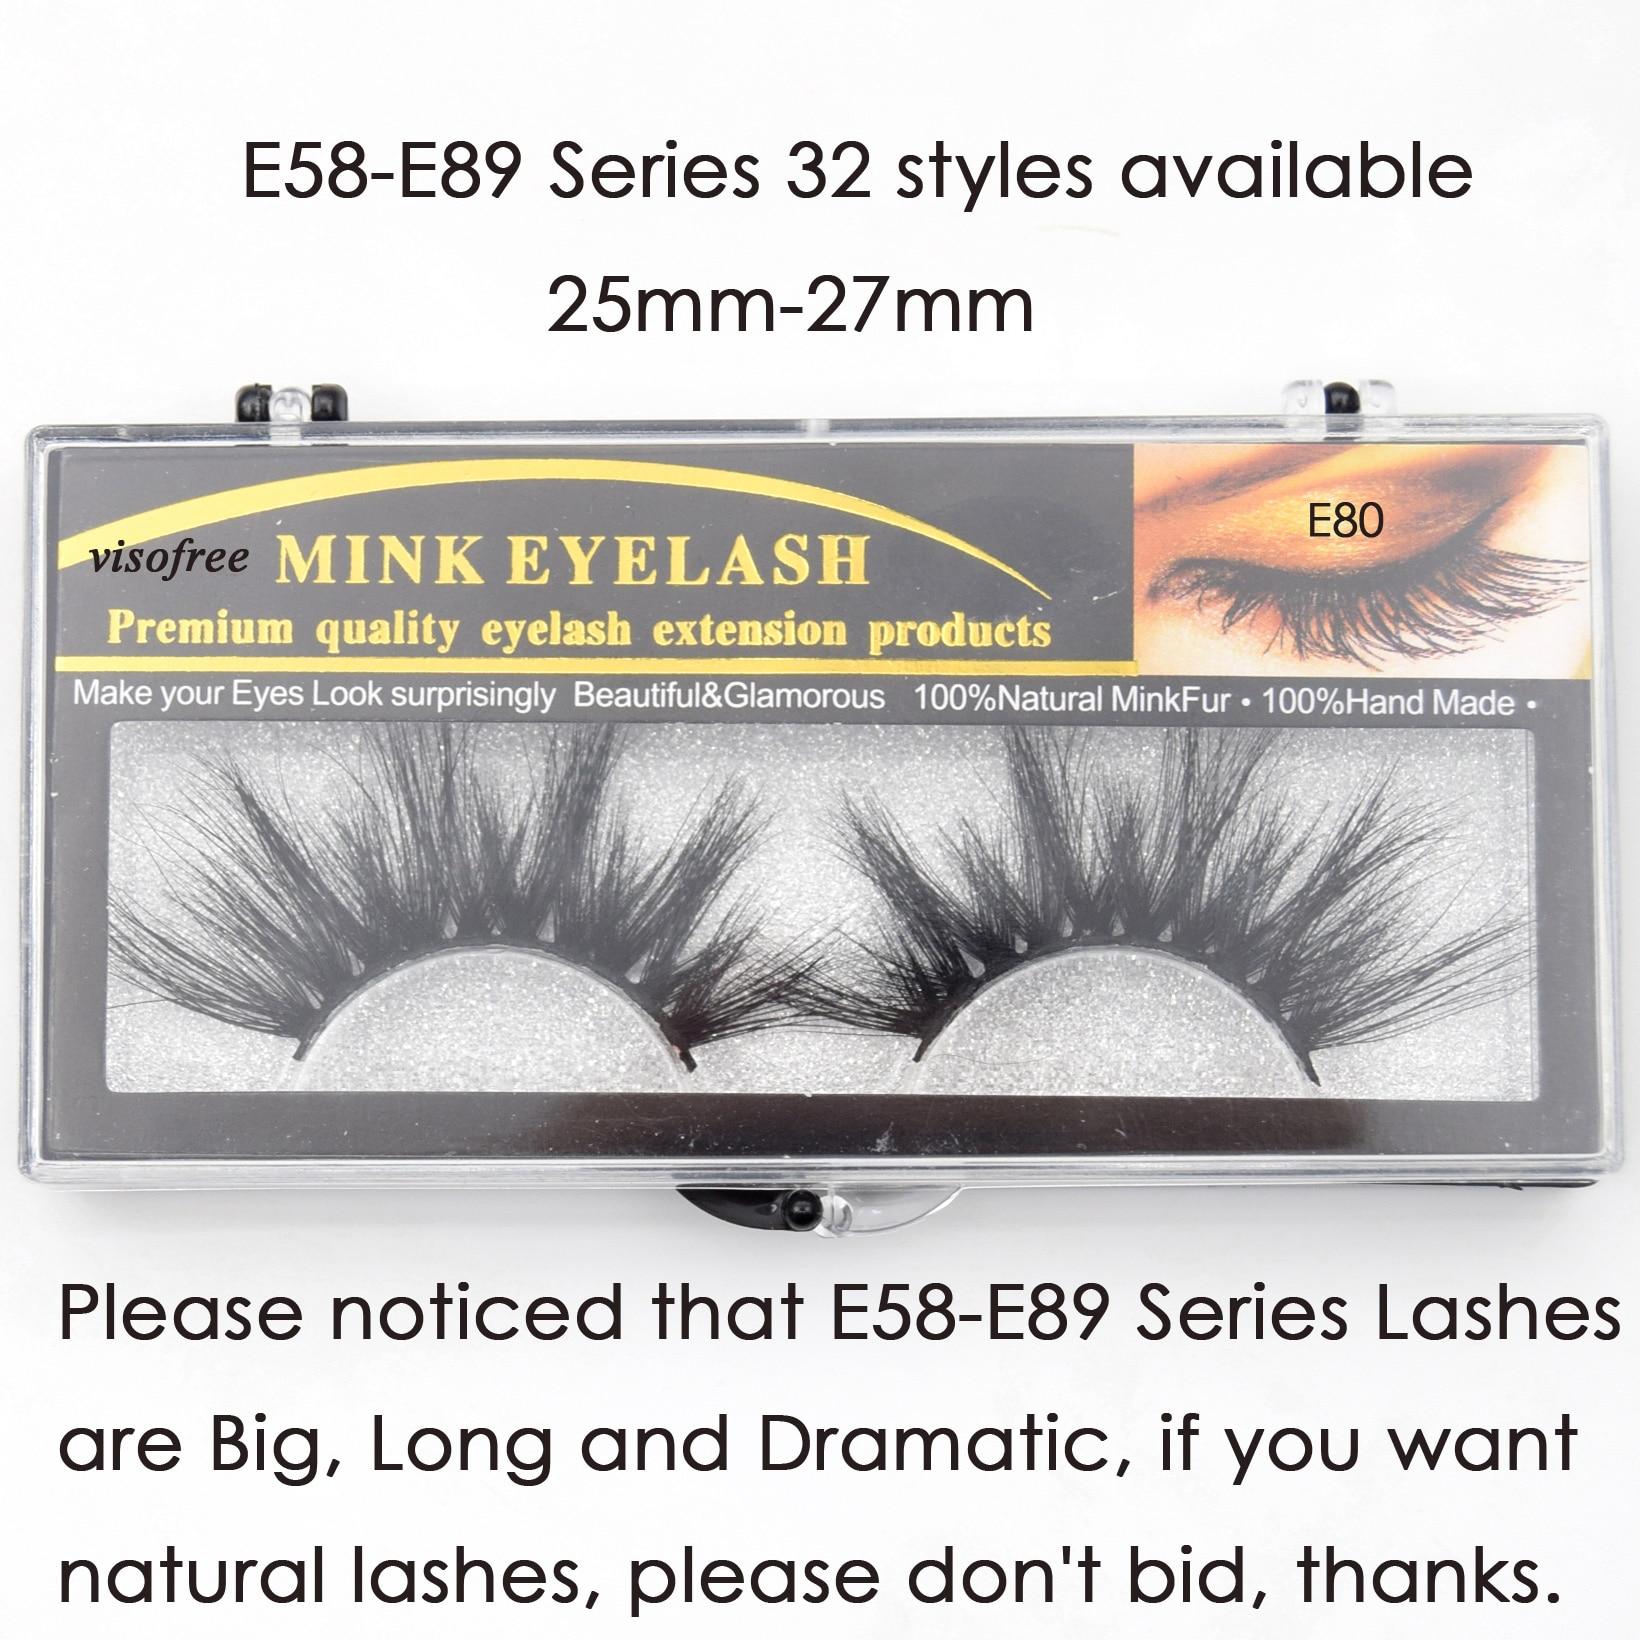 bec59b754a0 Visofree Eyelashes Mink Eyelashes Criss-cross Strands Cruelty Free High  Volume Mink Lashes Soft Dramatic Eye lashes E80 Makeup ~ Premium Deal July  2019